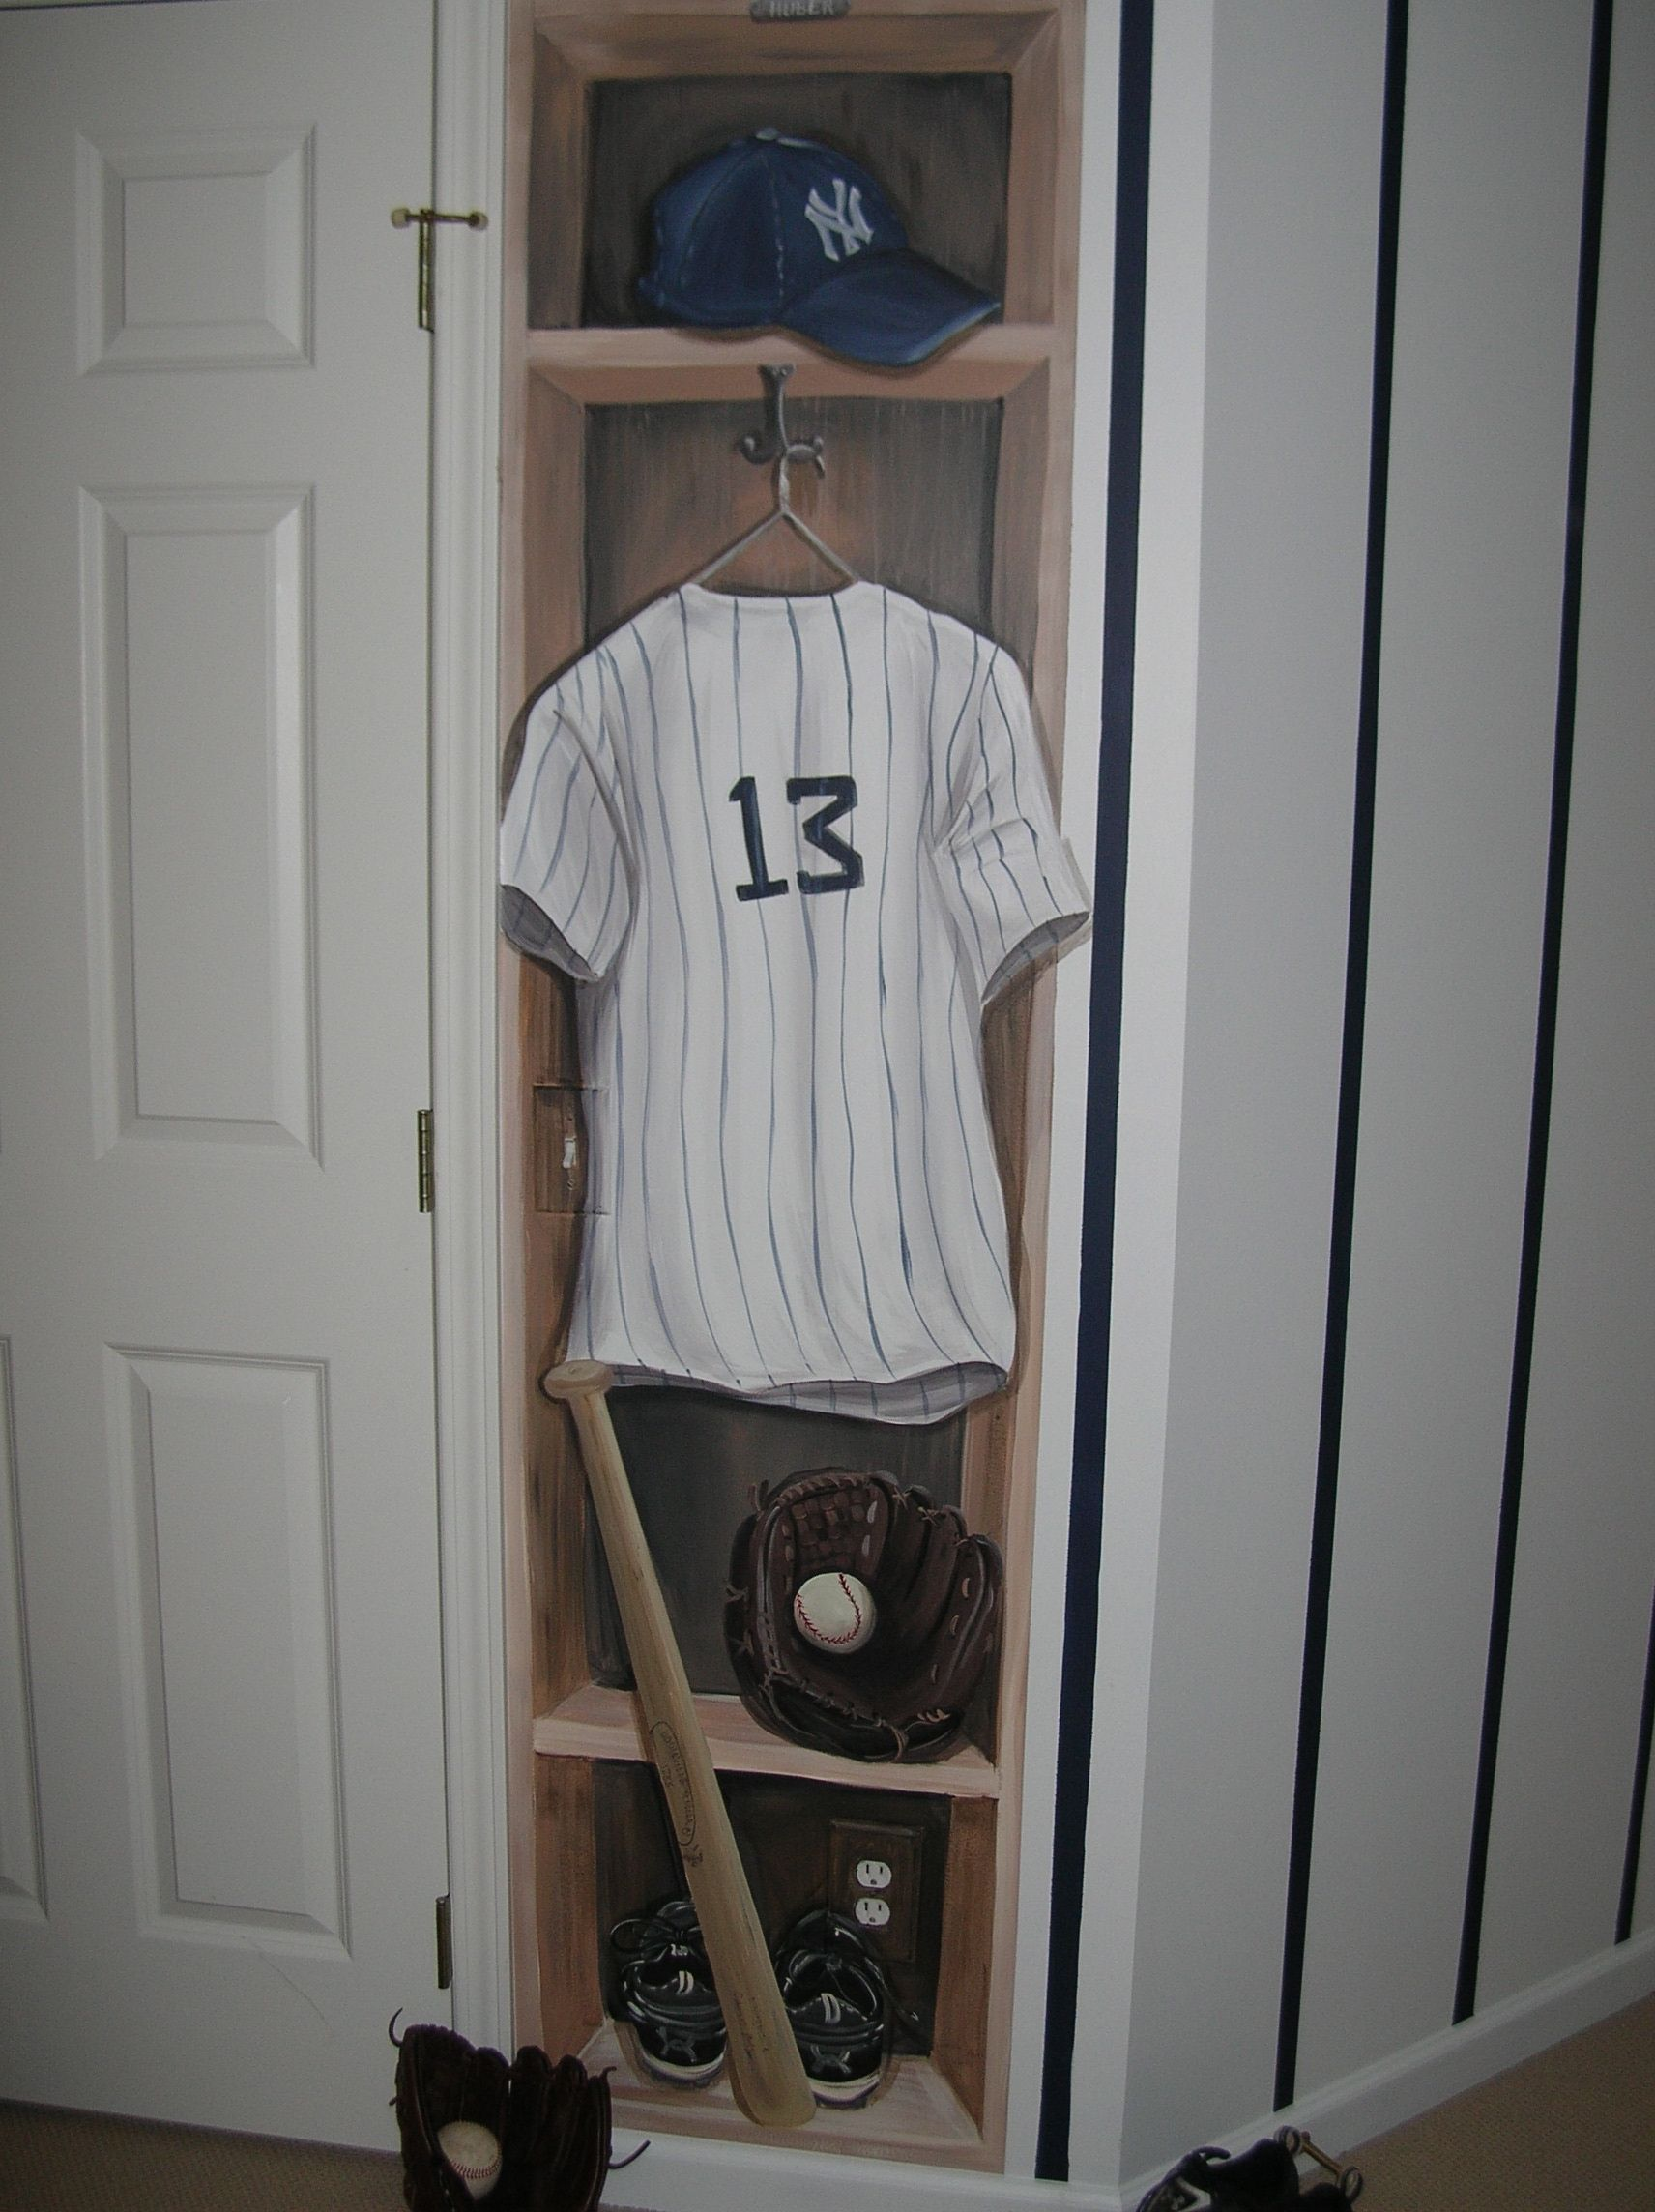 New York Yankees Bedroom Decor Hand Painted Tromp Loiel New York Yankees Locker With Signature